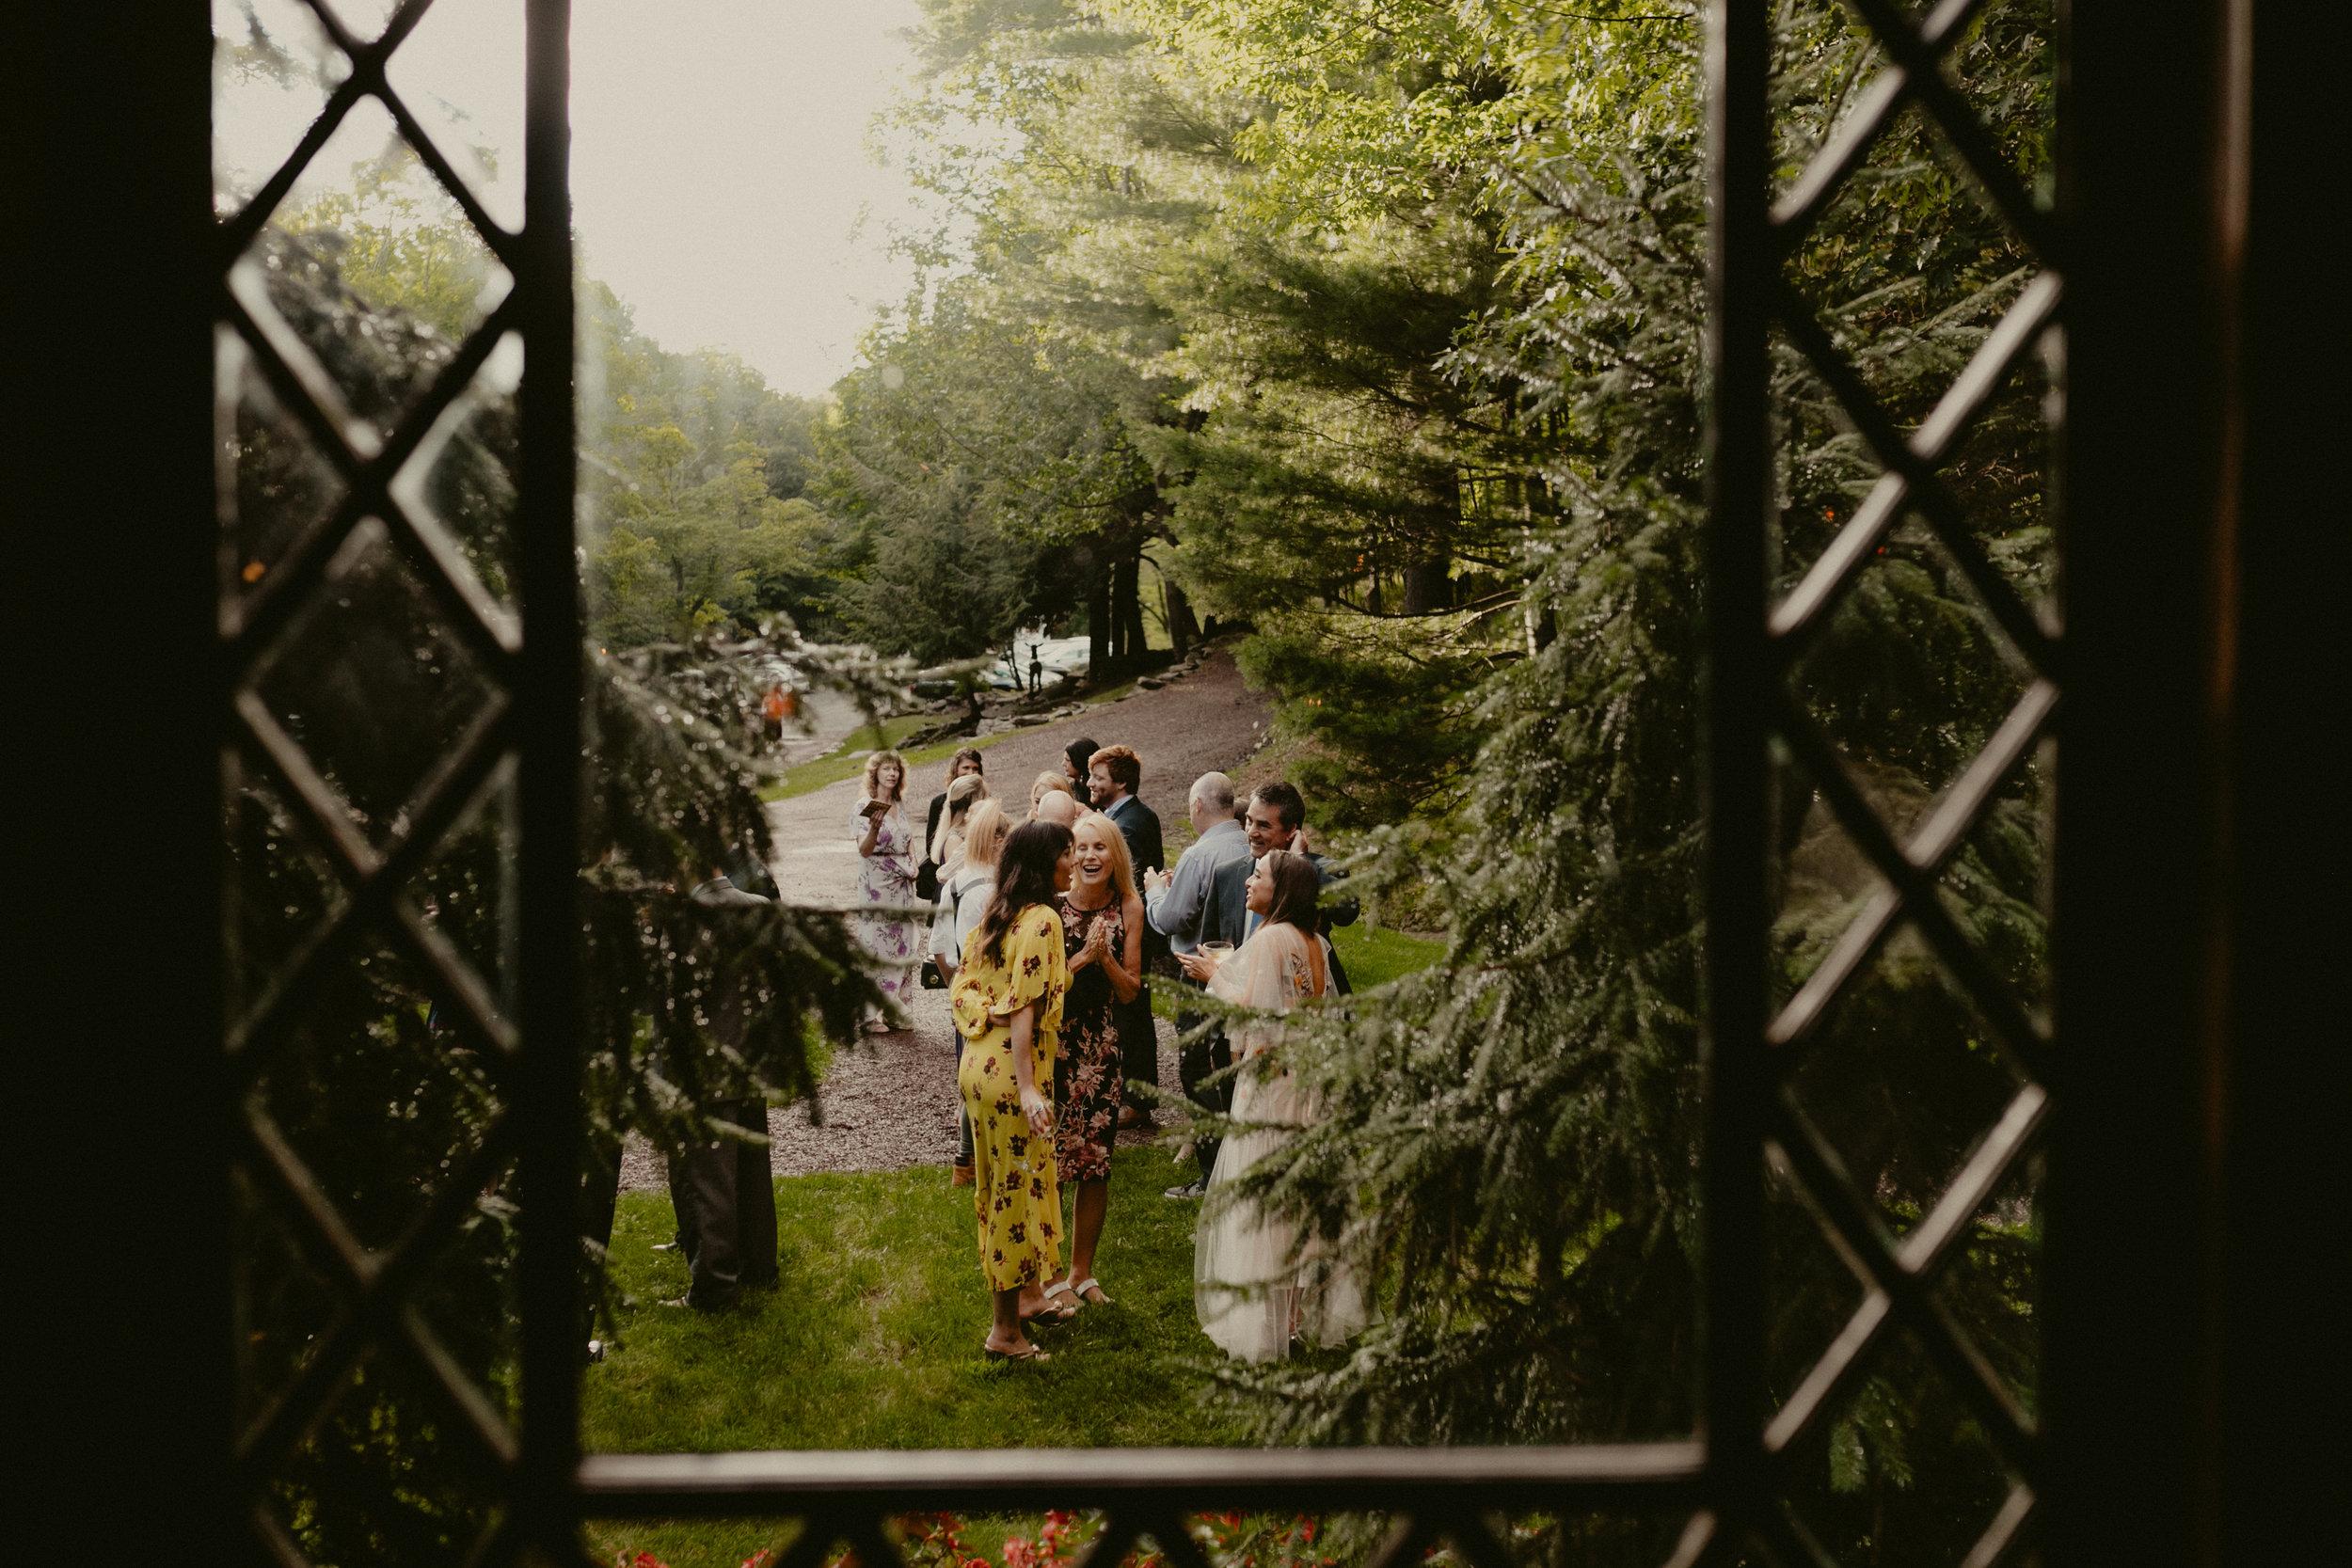 DEER_MOUNTAIN_INN_WEDDING_CHELLISE_MICHAEL_PHOTOGRAPHY-1460.jpg